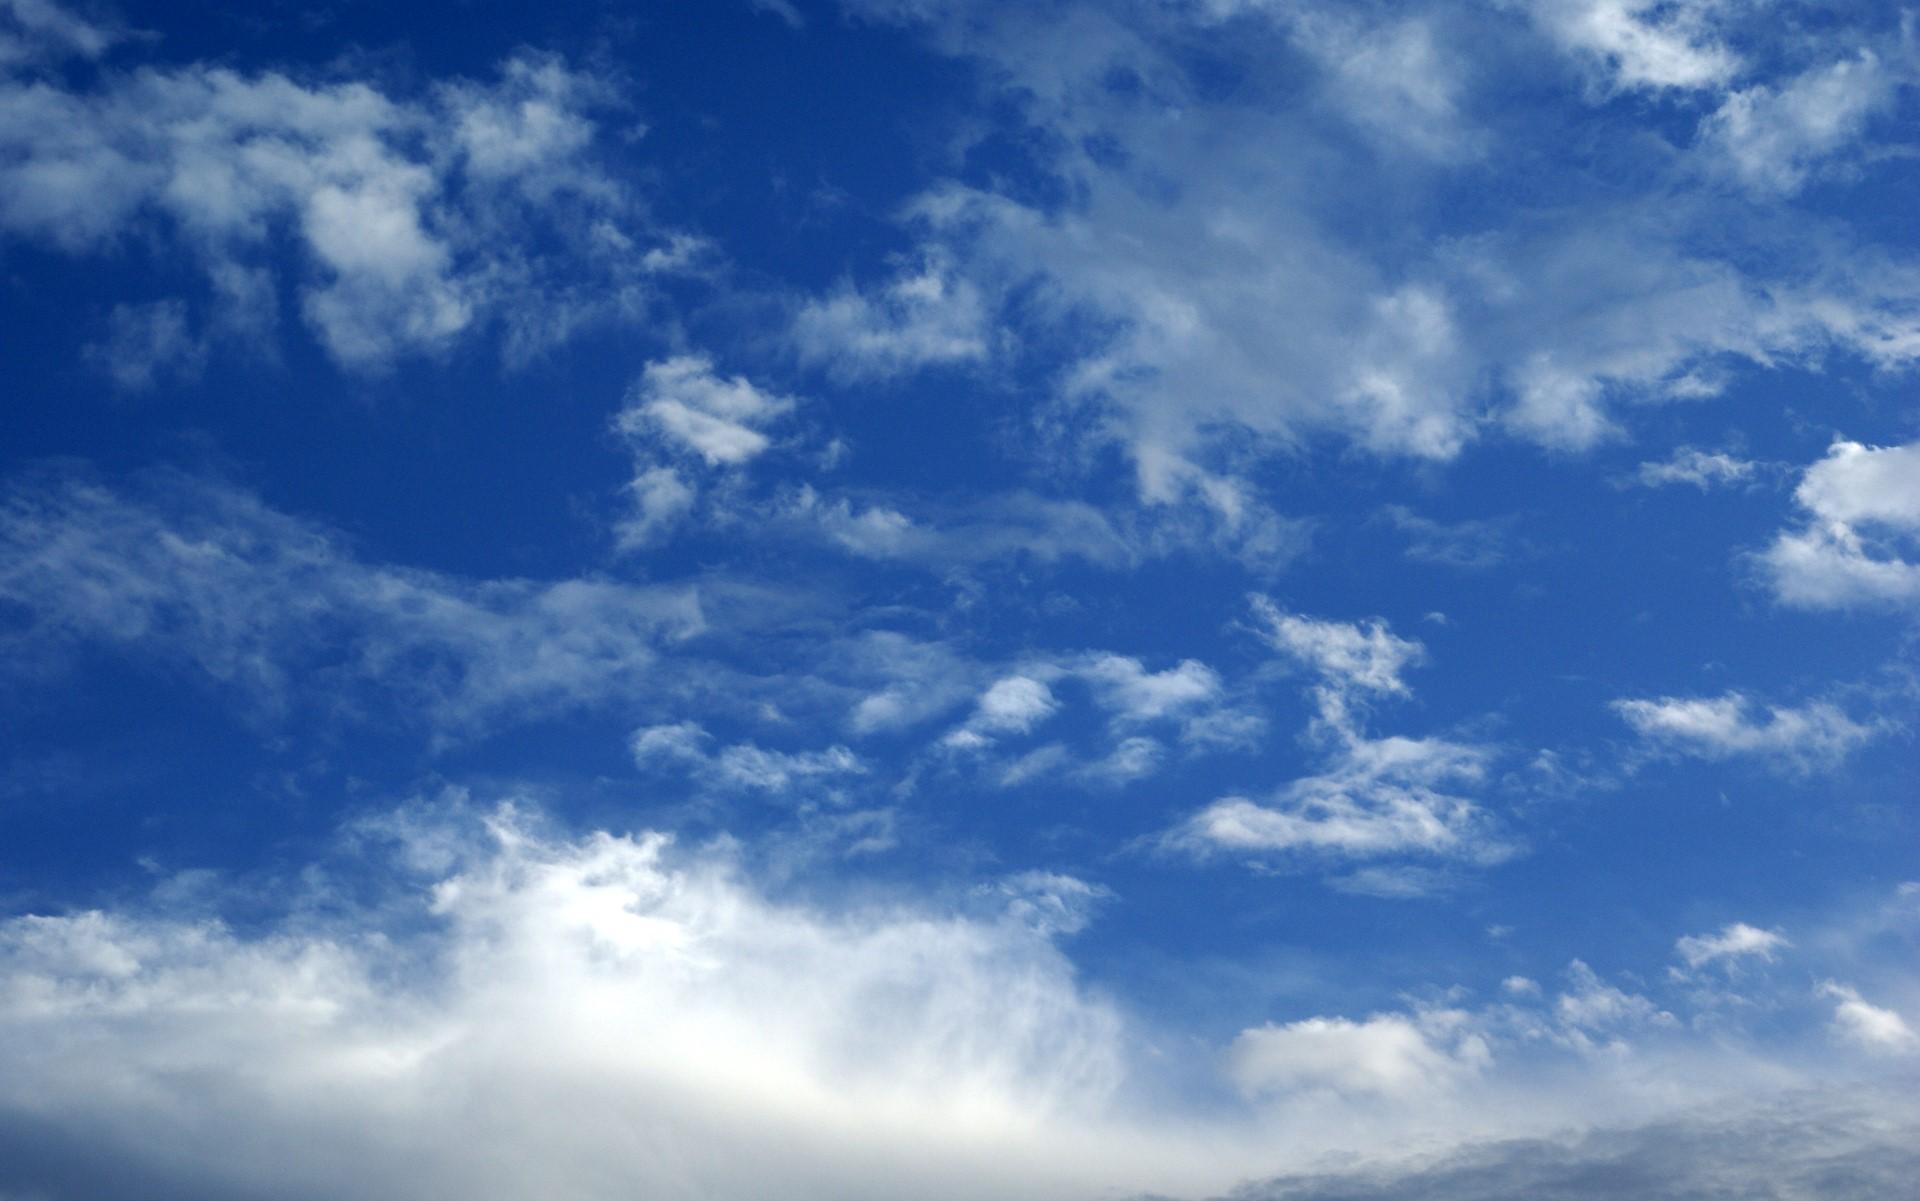 Bunny Wallpaper Cute Sky Background 9416 Hdwpro